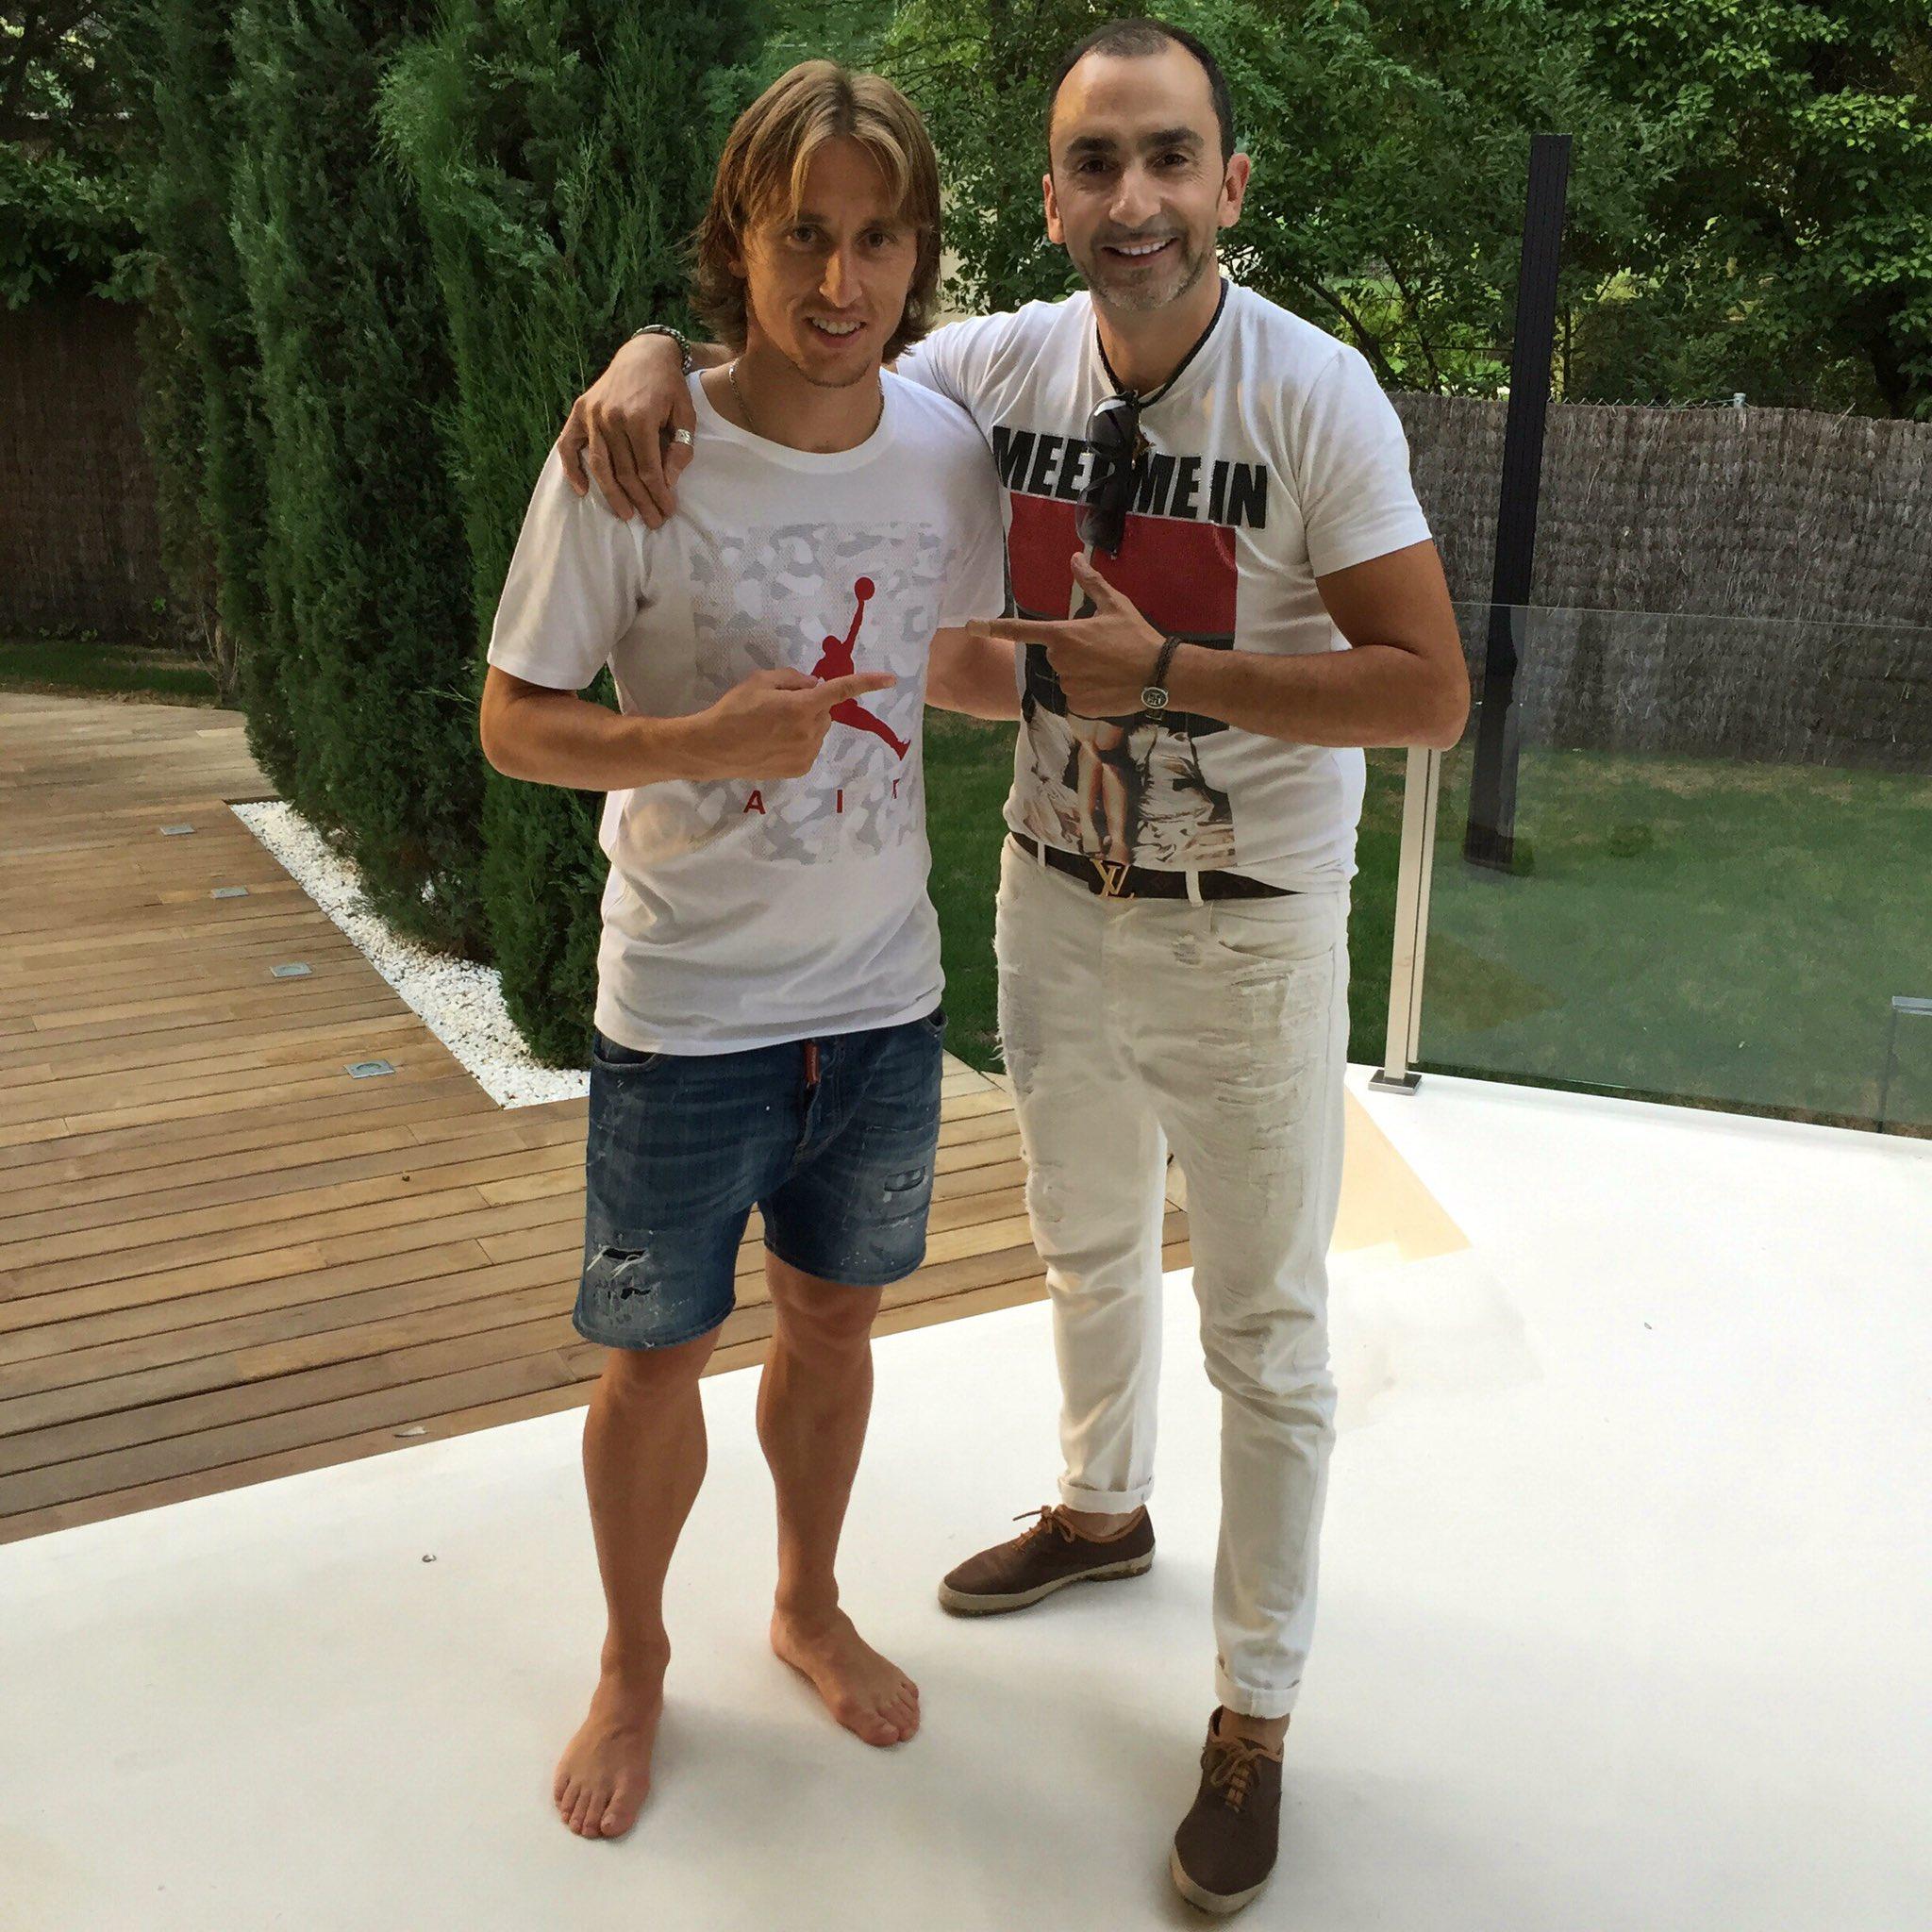 ¿Cuánto mide Luka Modric? - Altura - Real height - Página 2 Crsc8sjWIAA5Cy-?format=jpg&name=4096x4096